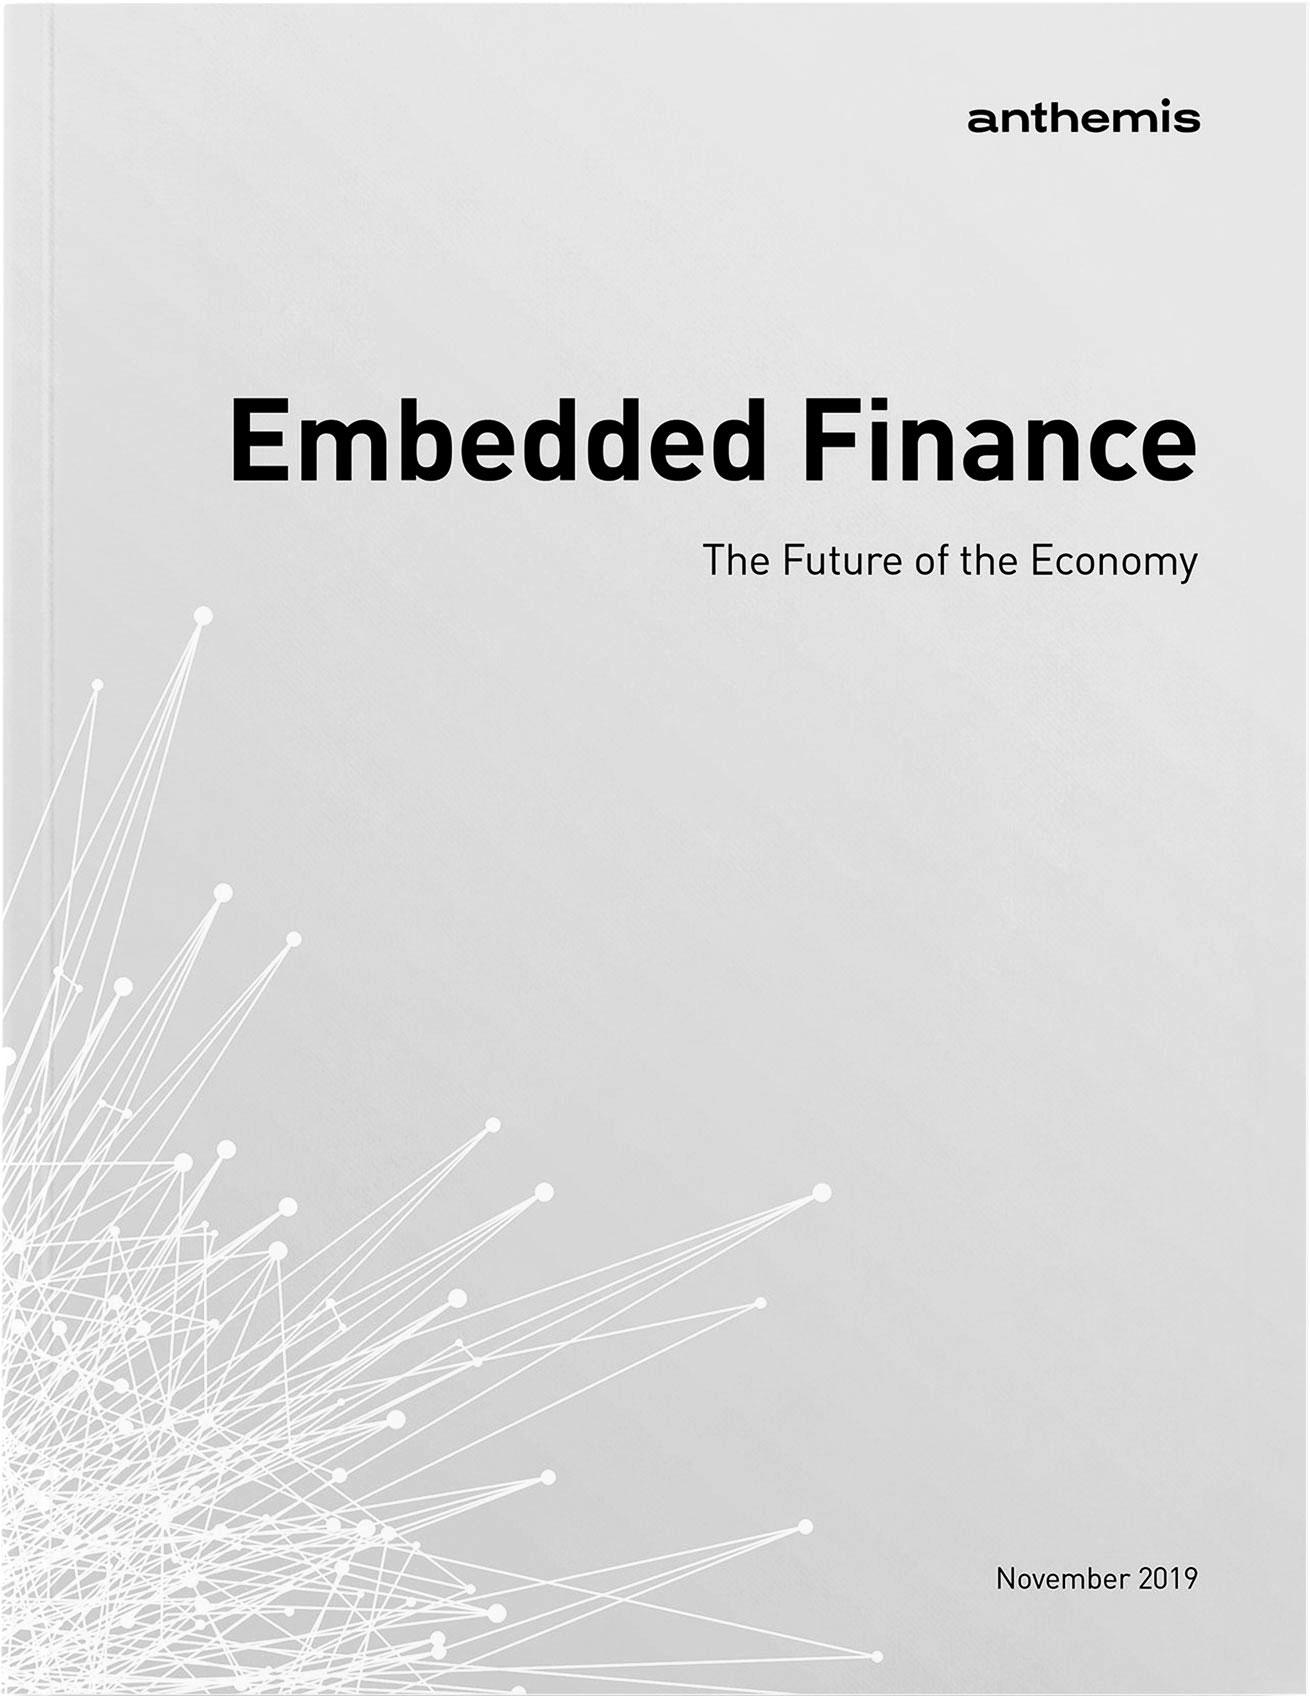 Anthemis-Embedded-Finance-White-Paper-November-2019-cover